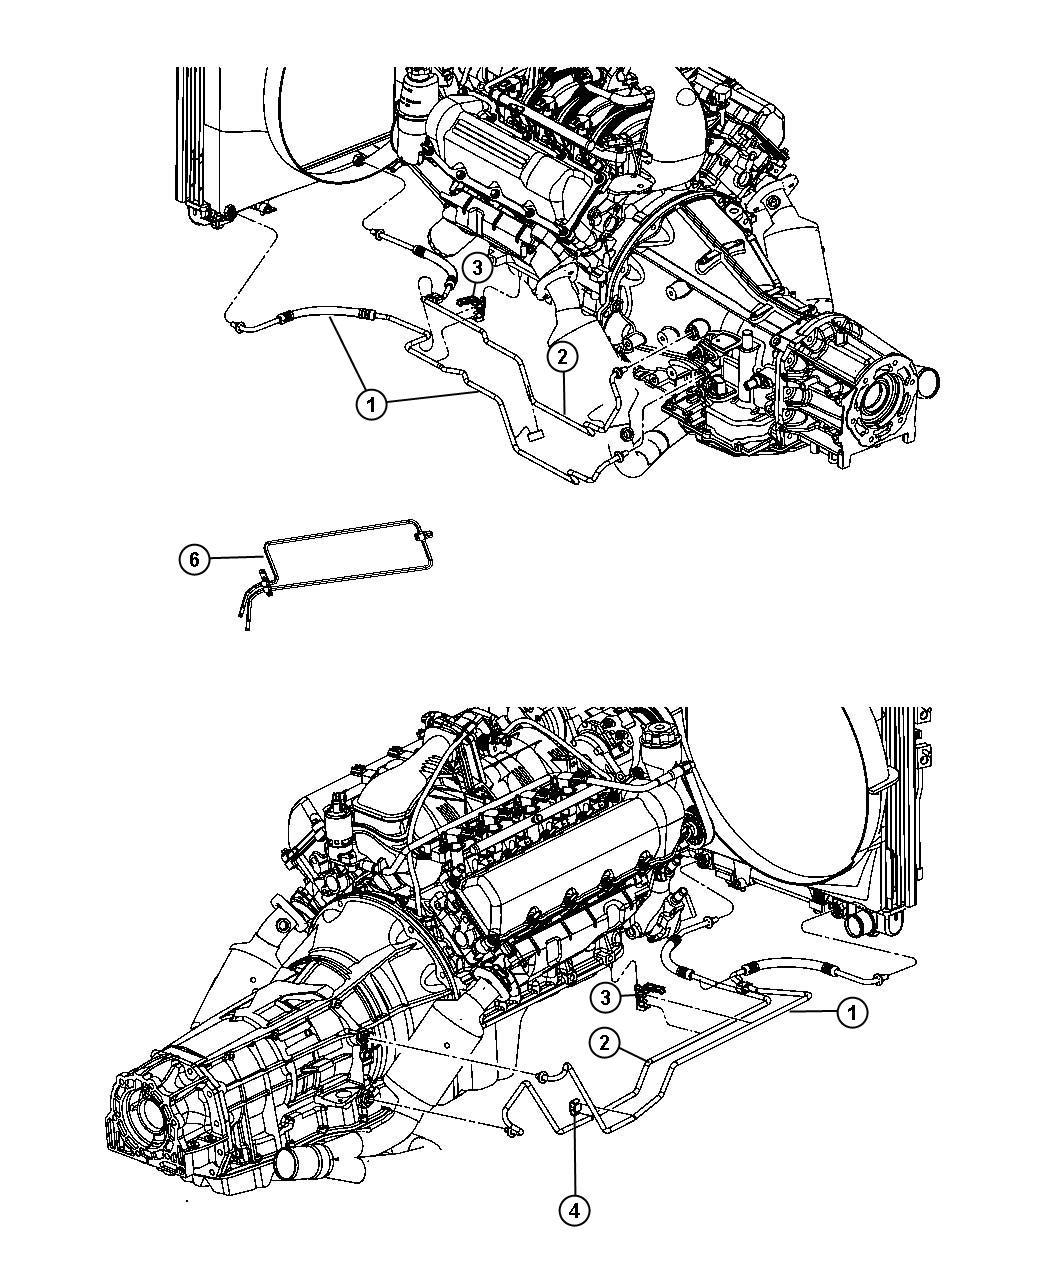 Dodge Dakota Used for: TUBE AND HOSE. Oil Cooler. Pressure ...